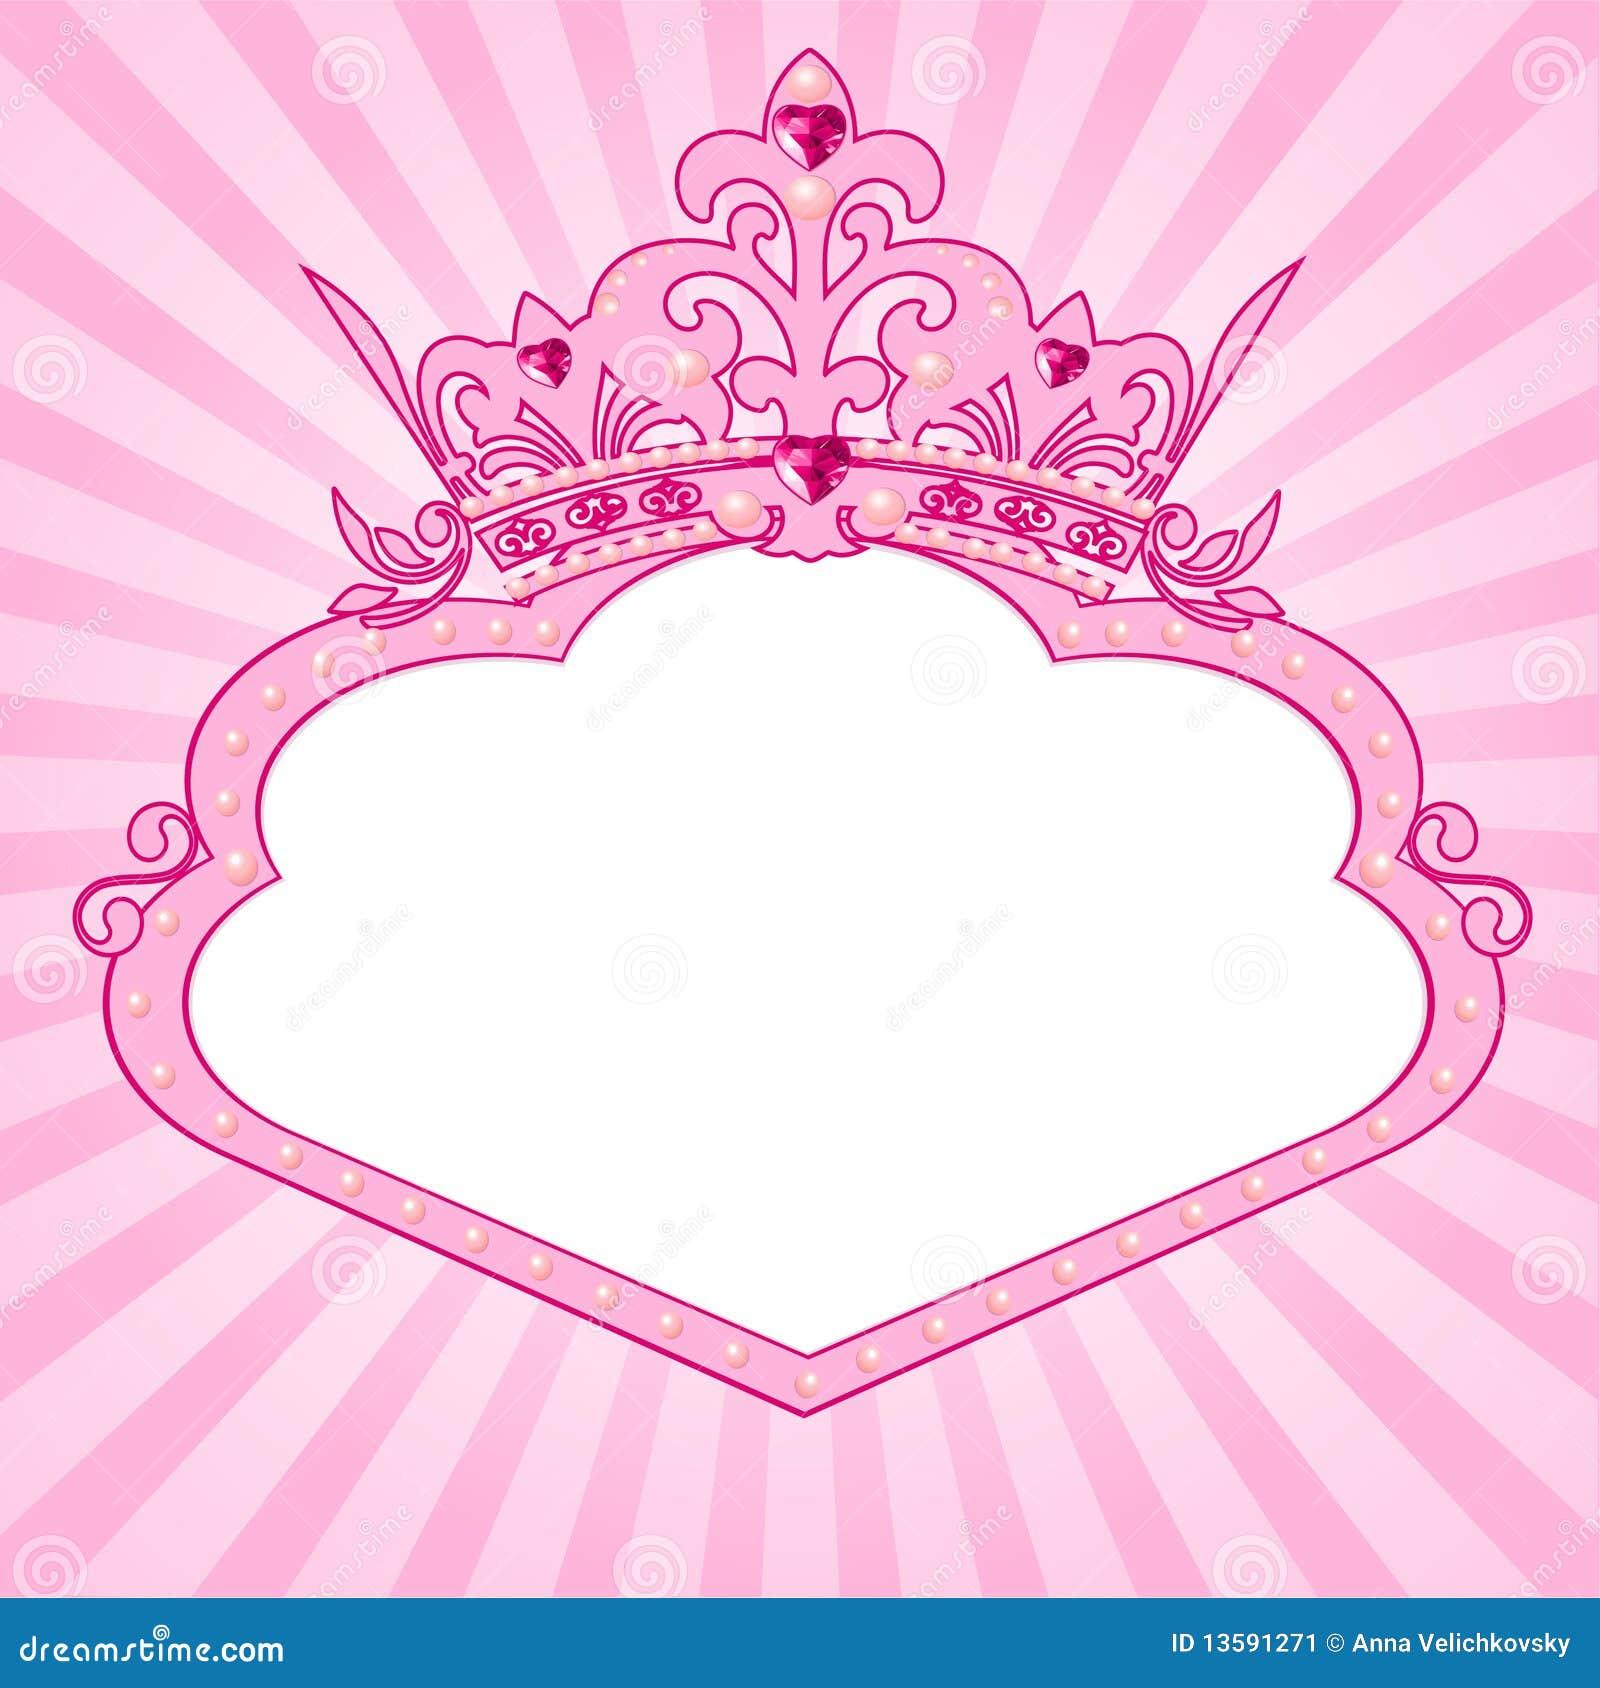 princess mirror clipart - photo #37